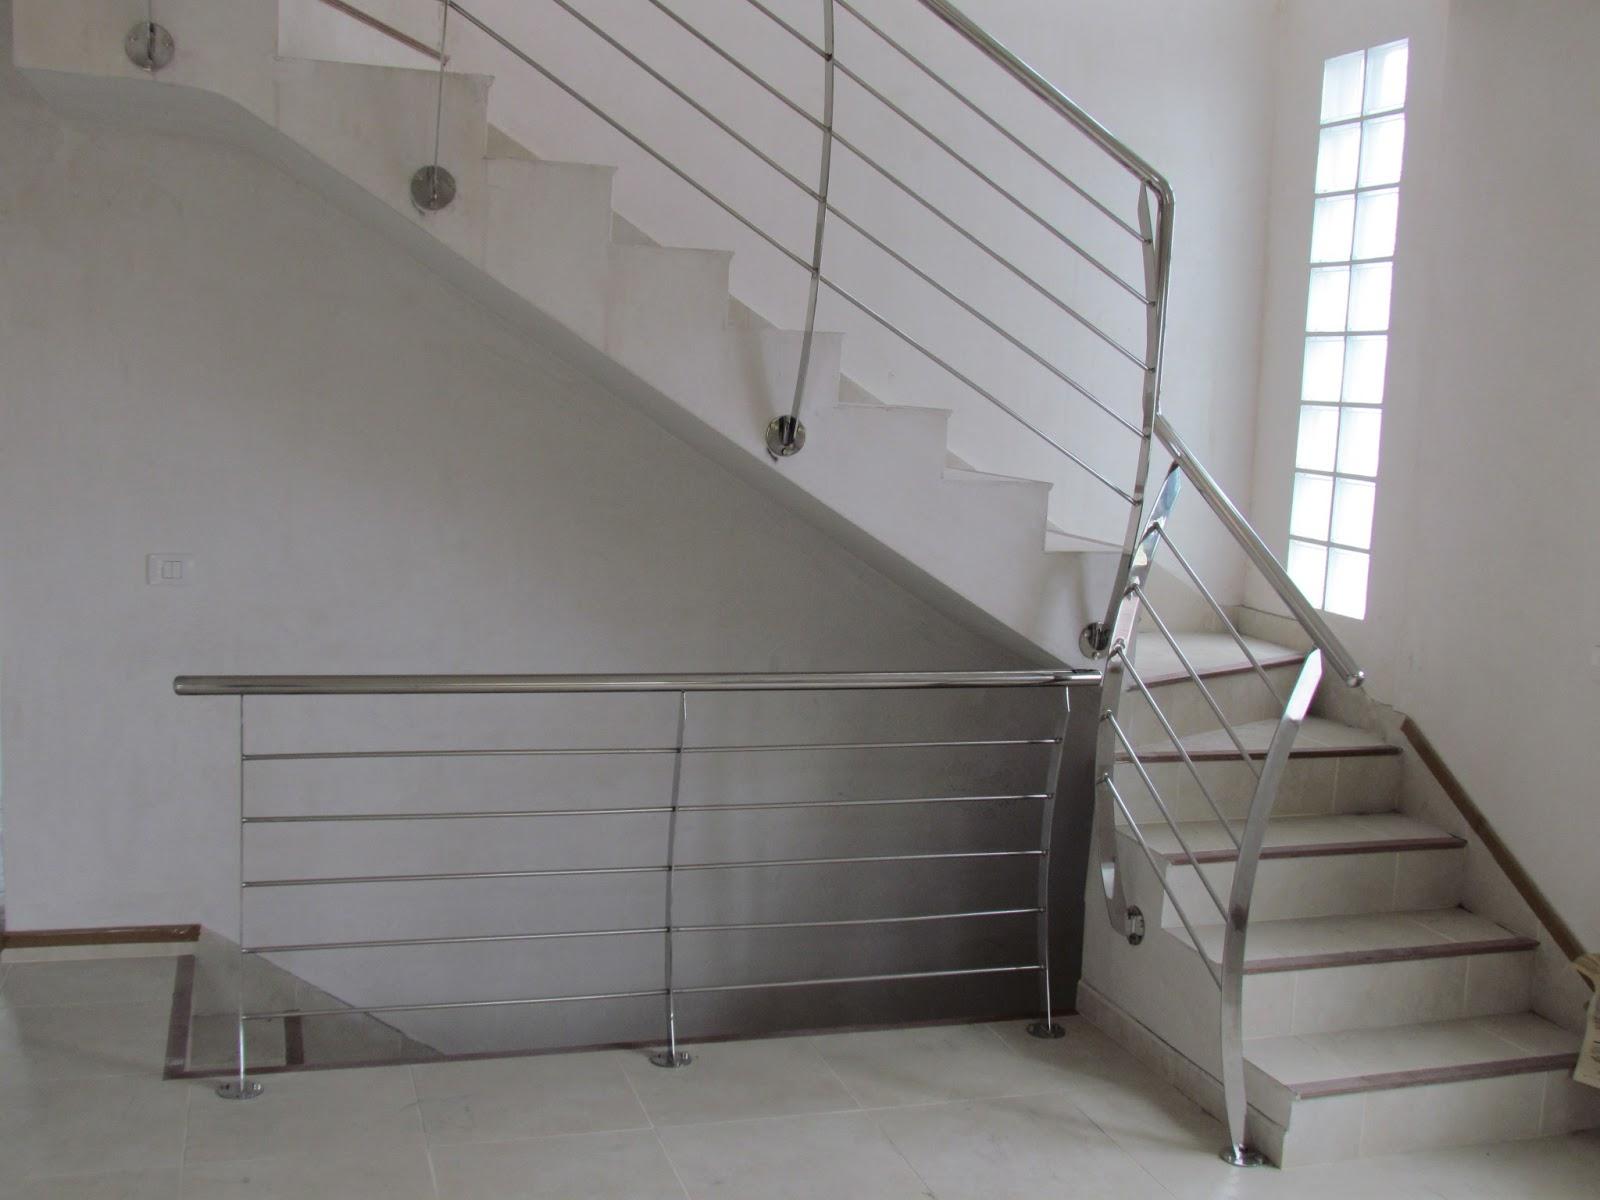 Acero inoxidable tenerife 7 modelos de barandilla acero inoxidable modernas - Barandillas para escaleras interiores modernas ...